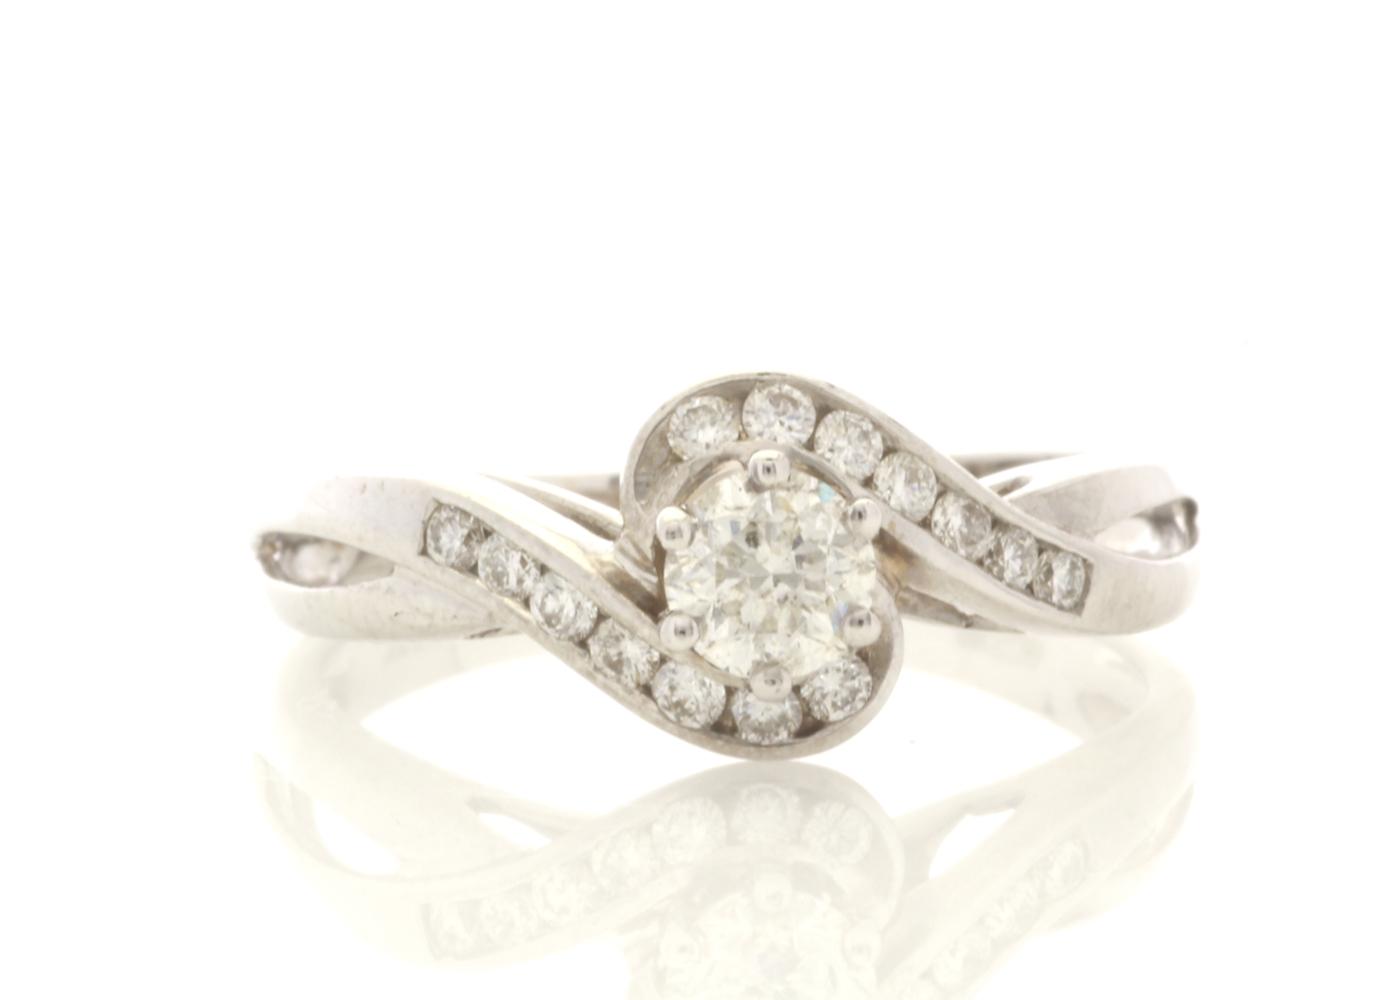 18ct White Gold Stone Set Shoulders Diamond Ring 0.61 Carats